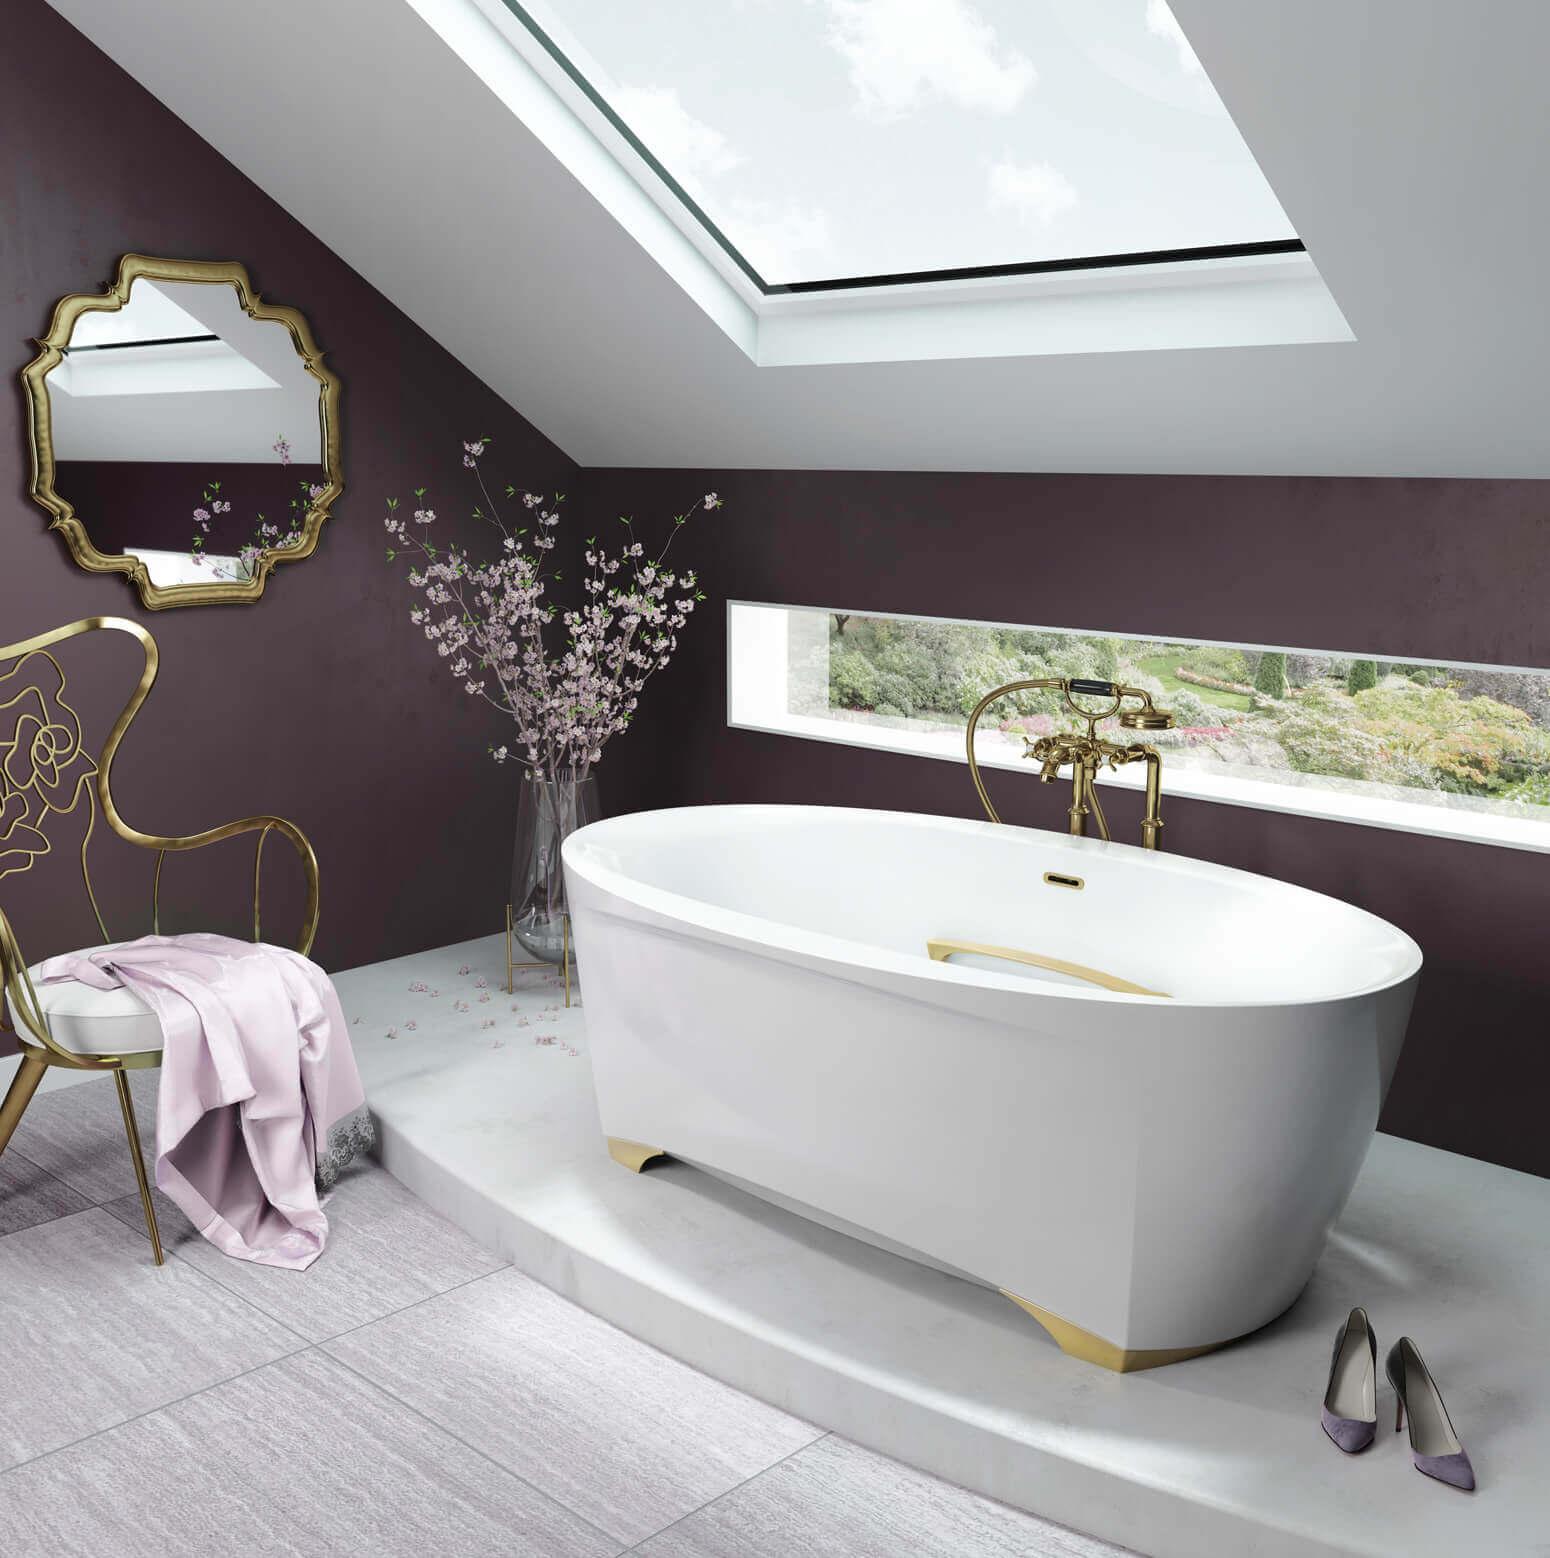 Scala 6638 air jet bathtub for your master bathroom